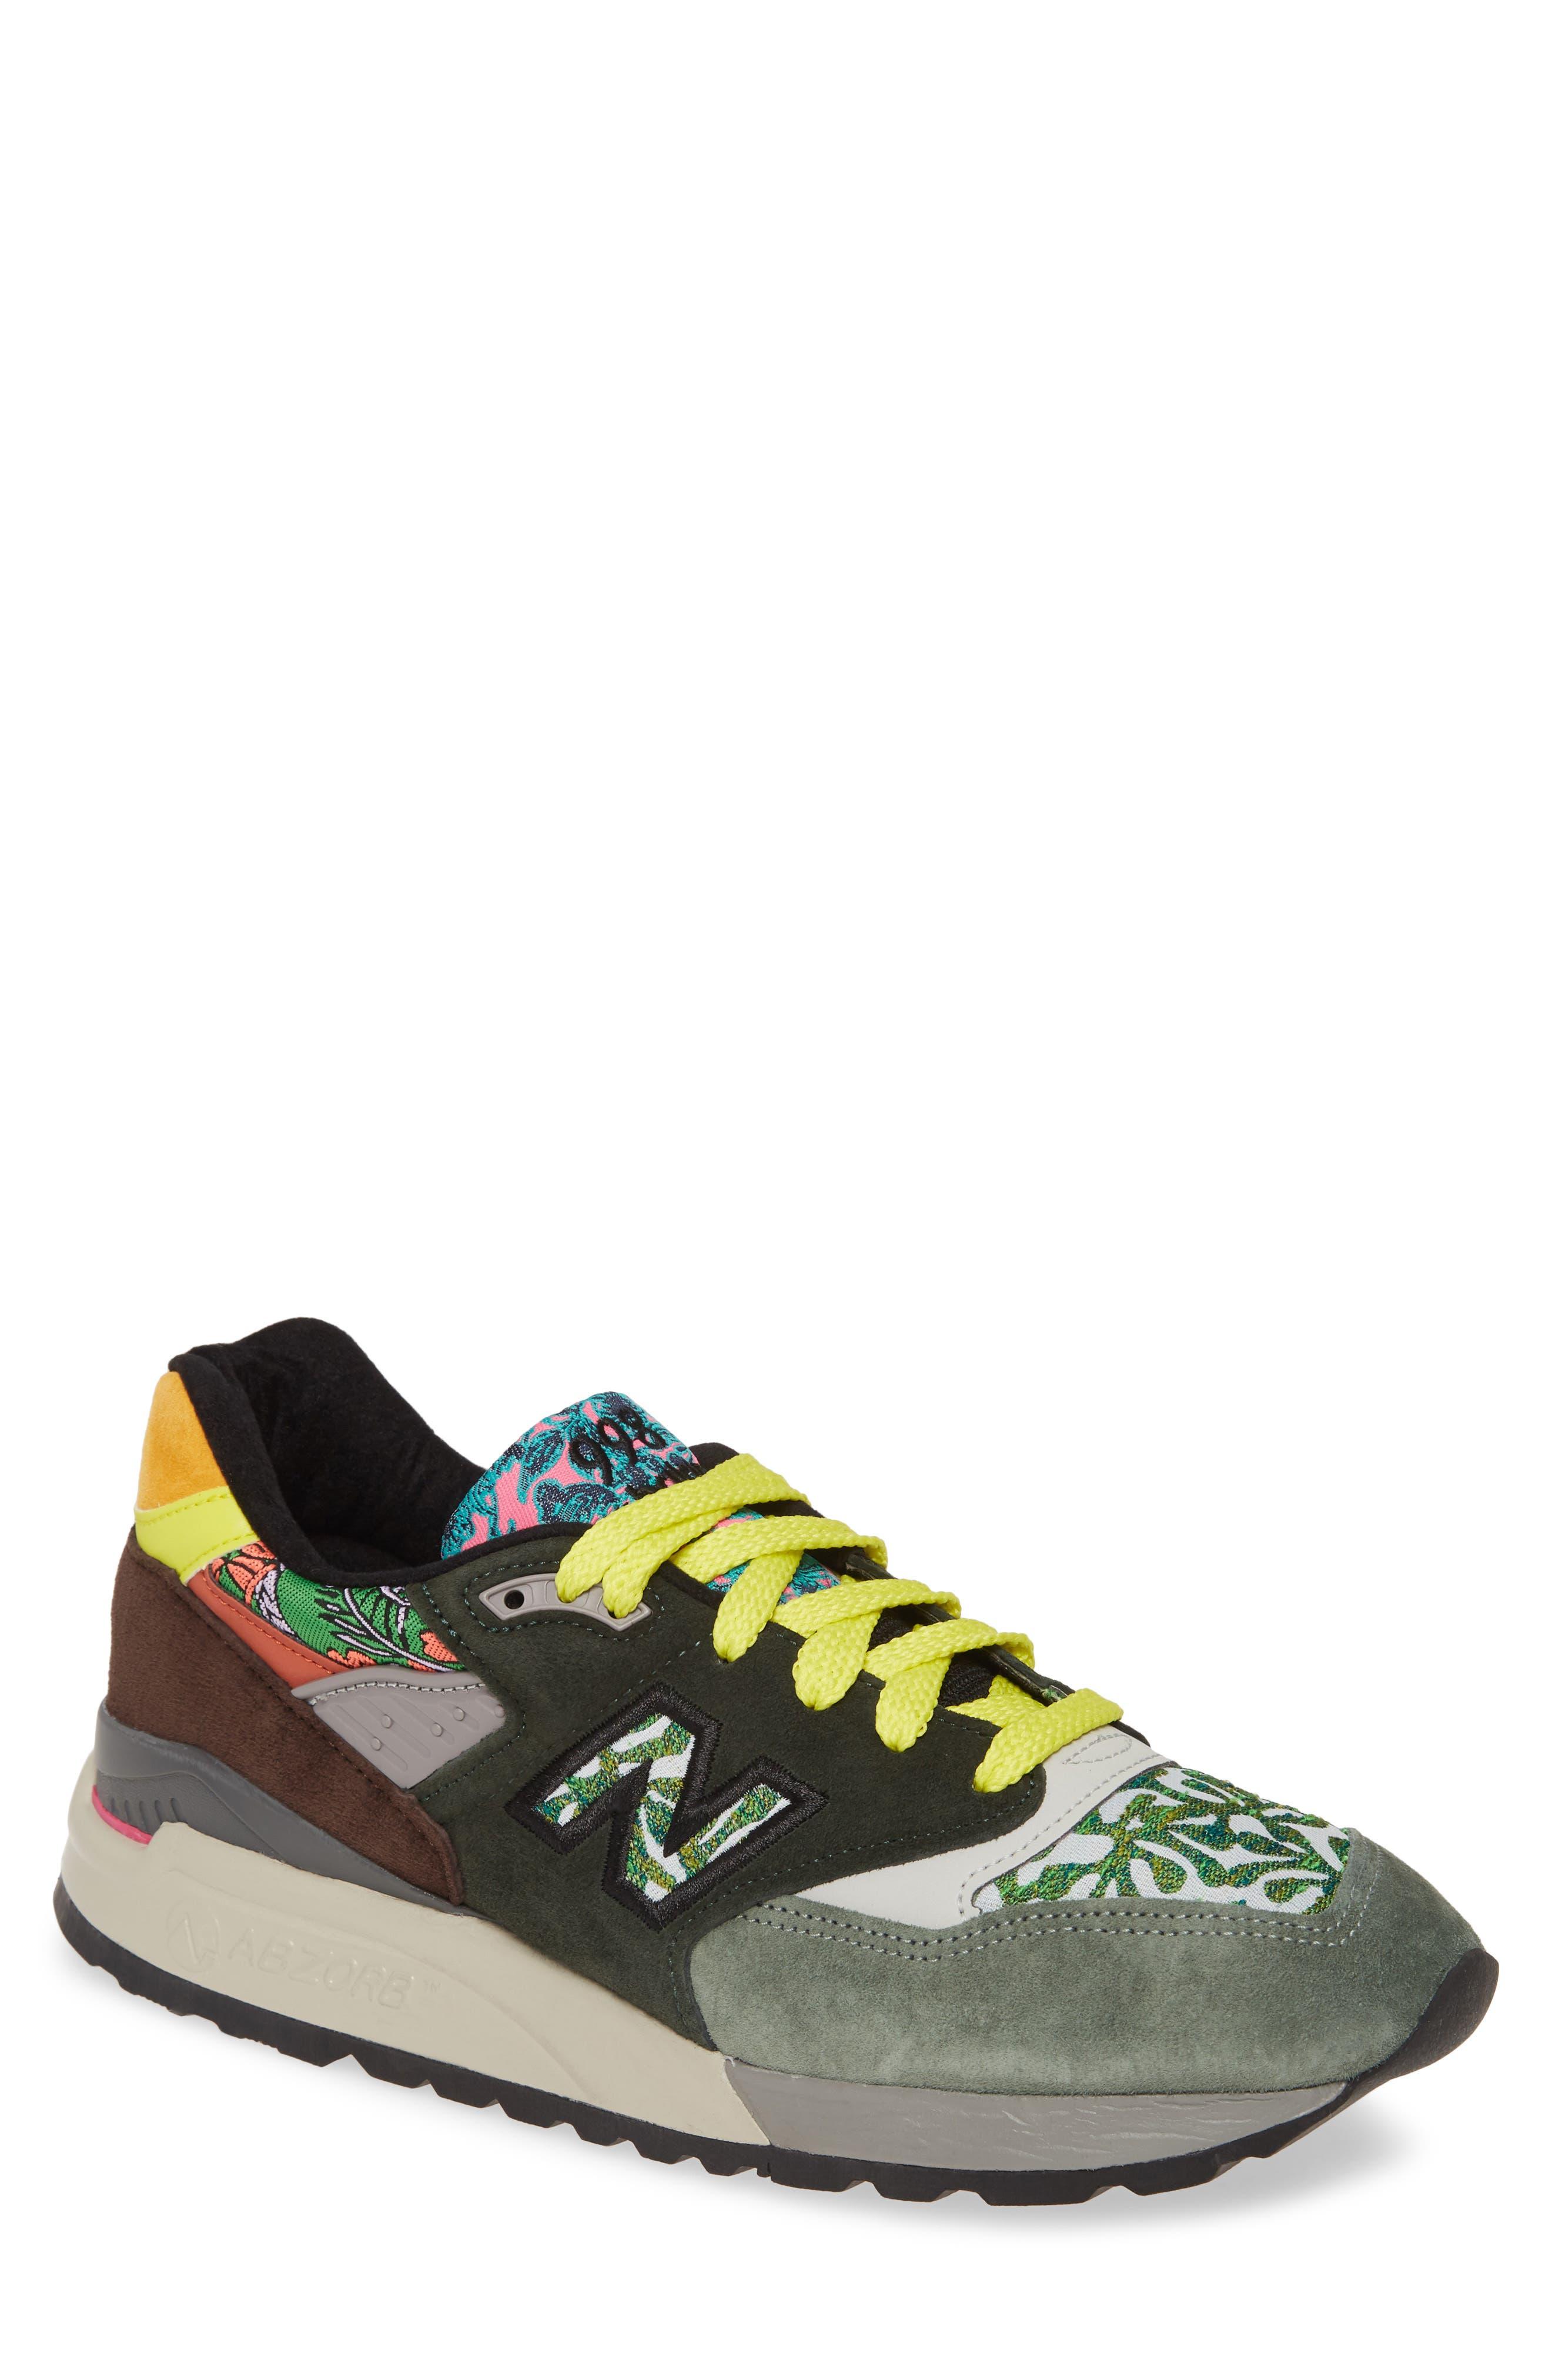 New Balance Topman & Trend Shoes for Men | Nordstrom